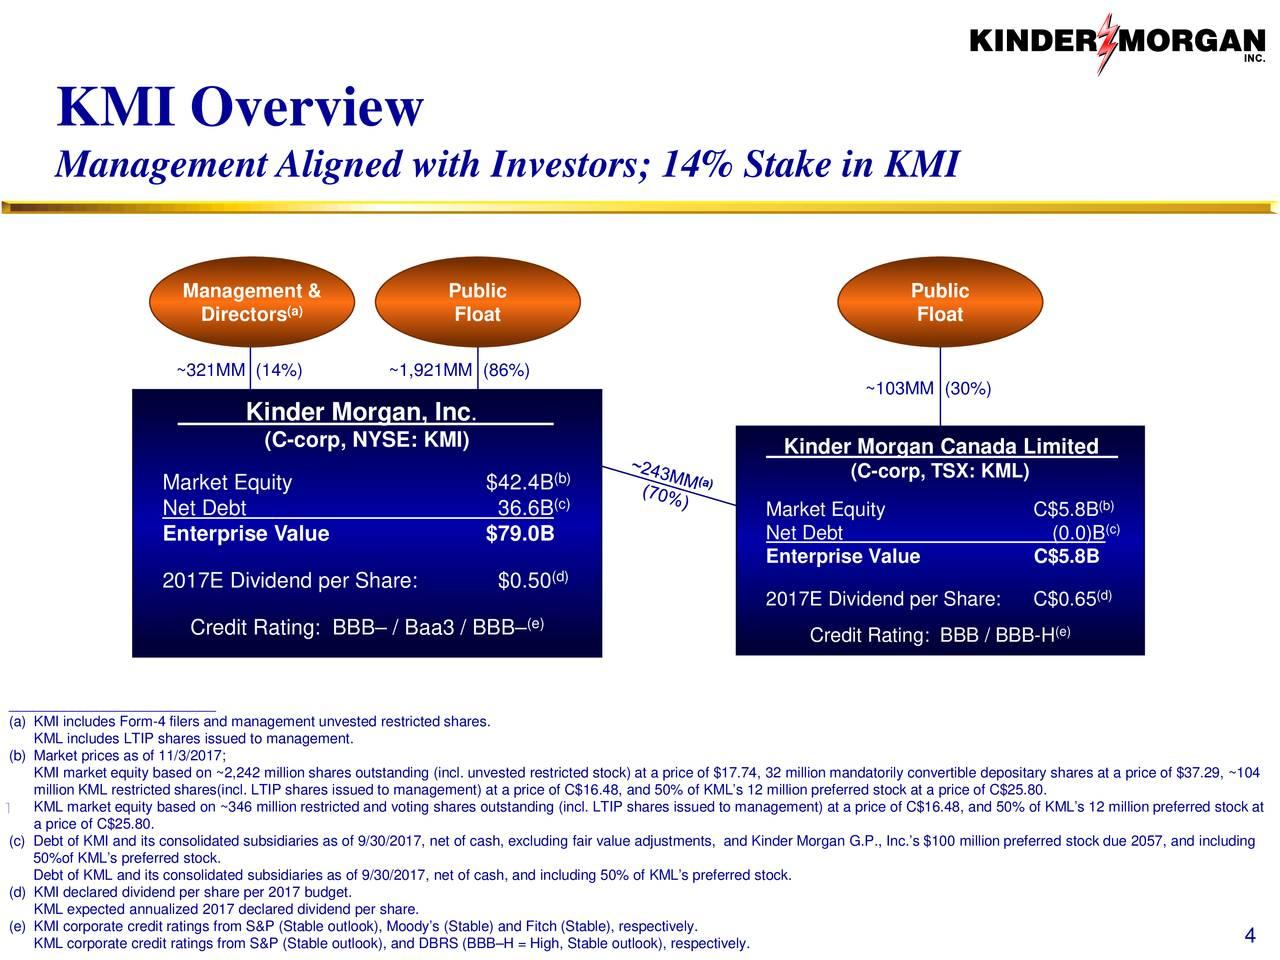 Kinder Morgan Stock Quote Kinder Morgan Kmi Presents At Bank Of America Merrill Lynch